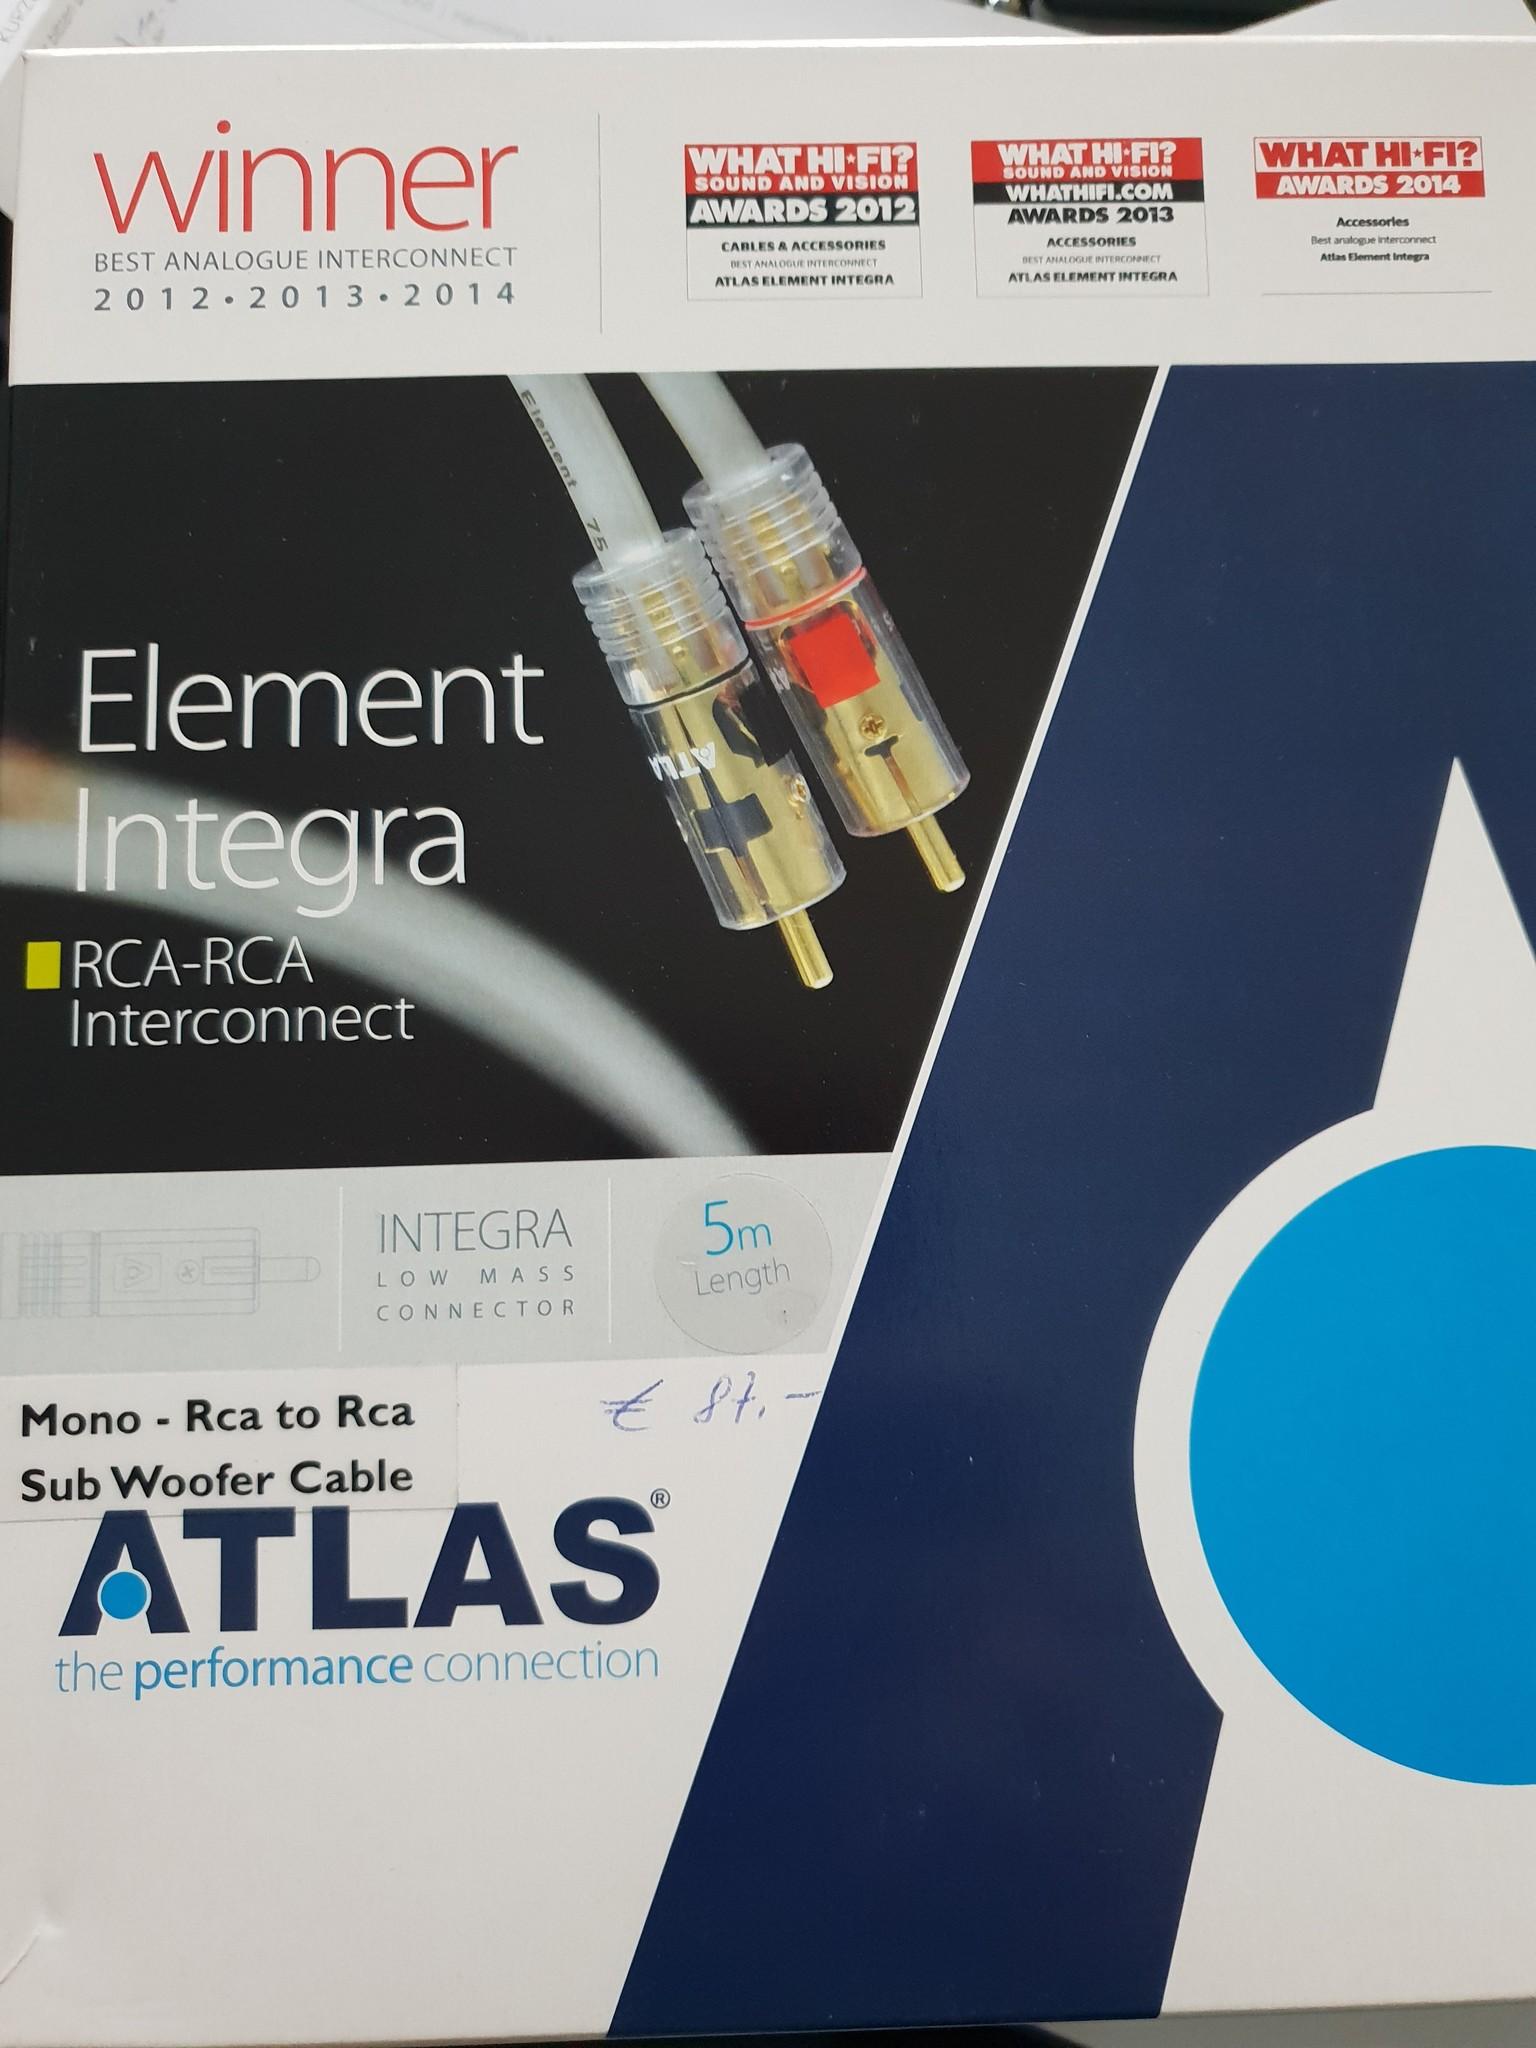 Atlas Atlas Element Integra RCA-RCA Interconnect Mono Sub 5m